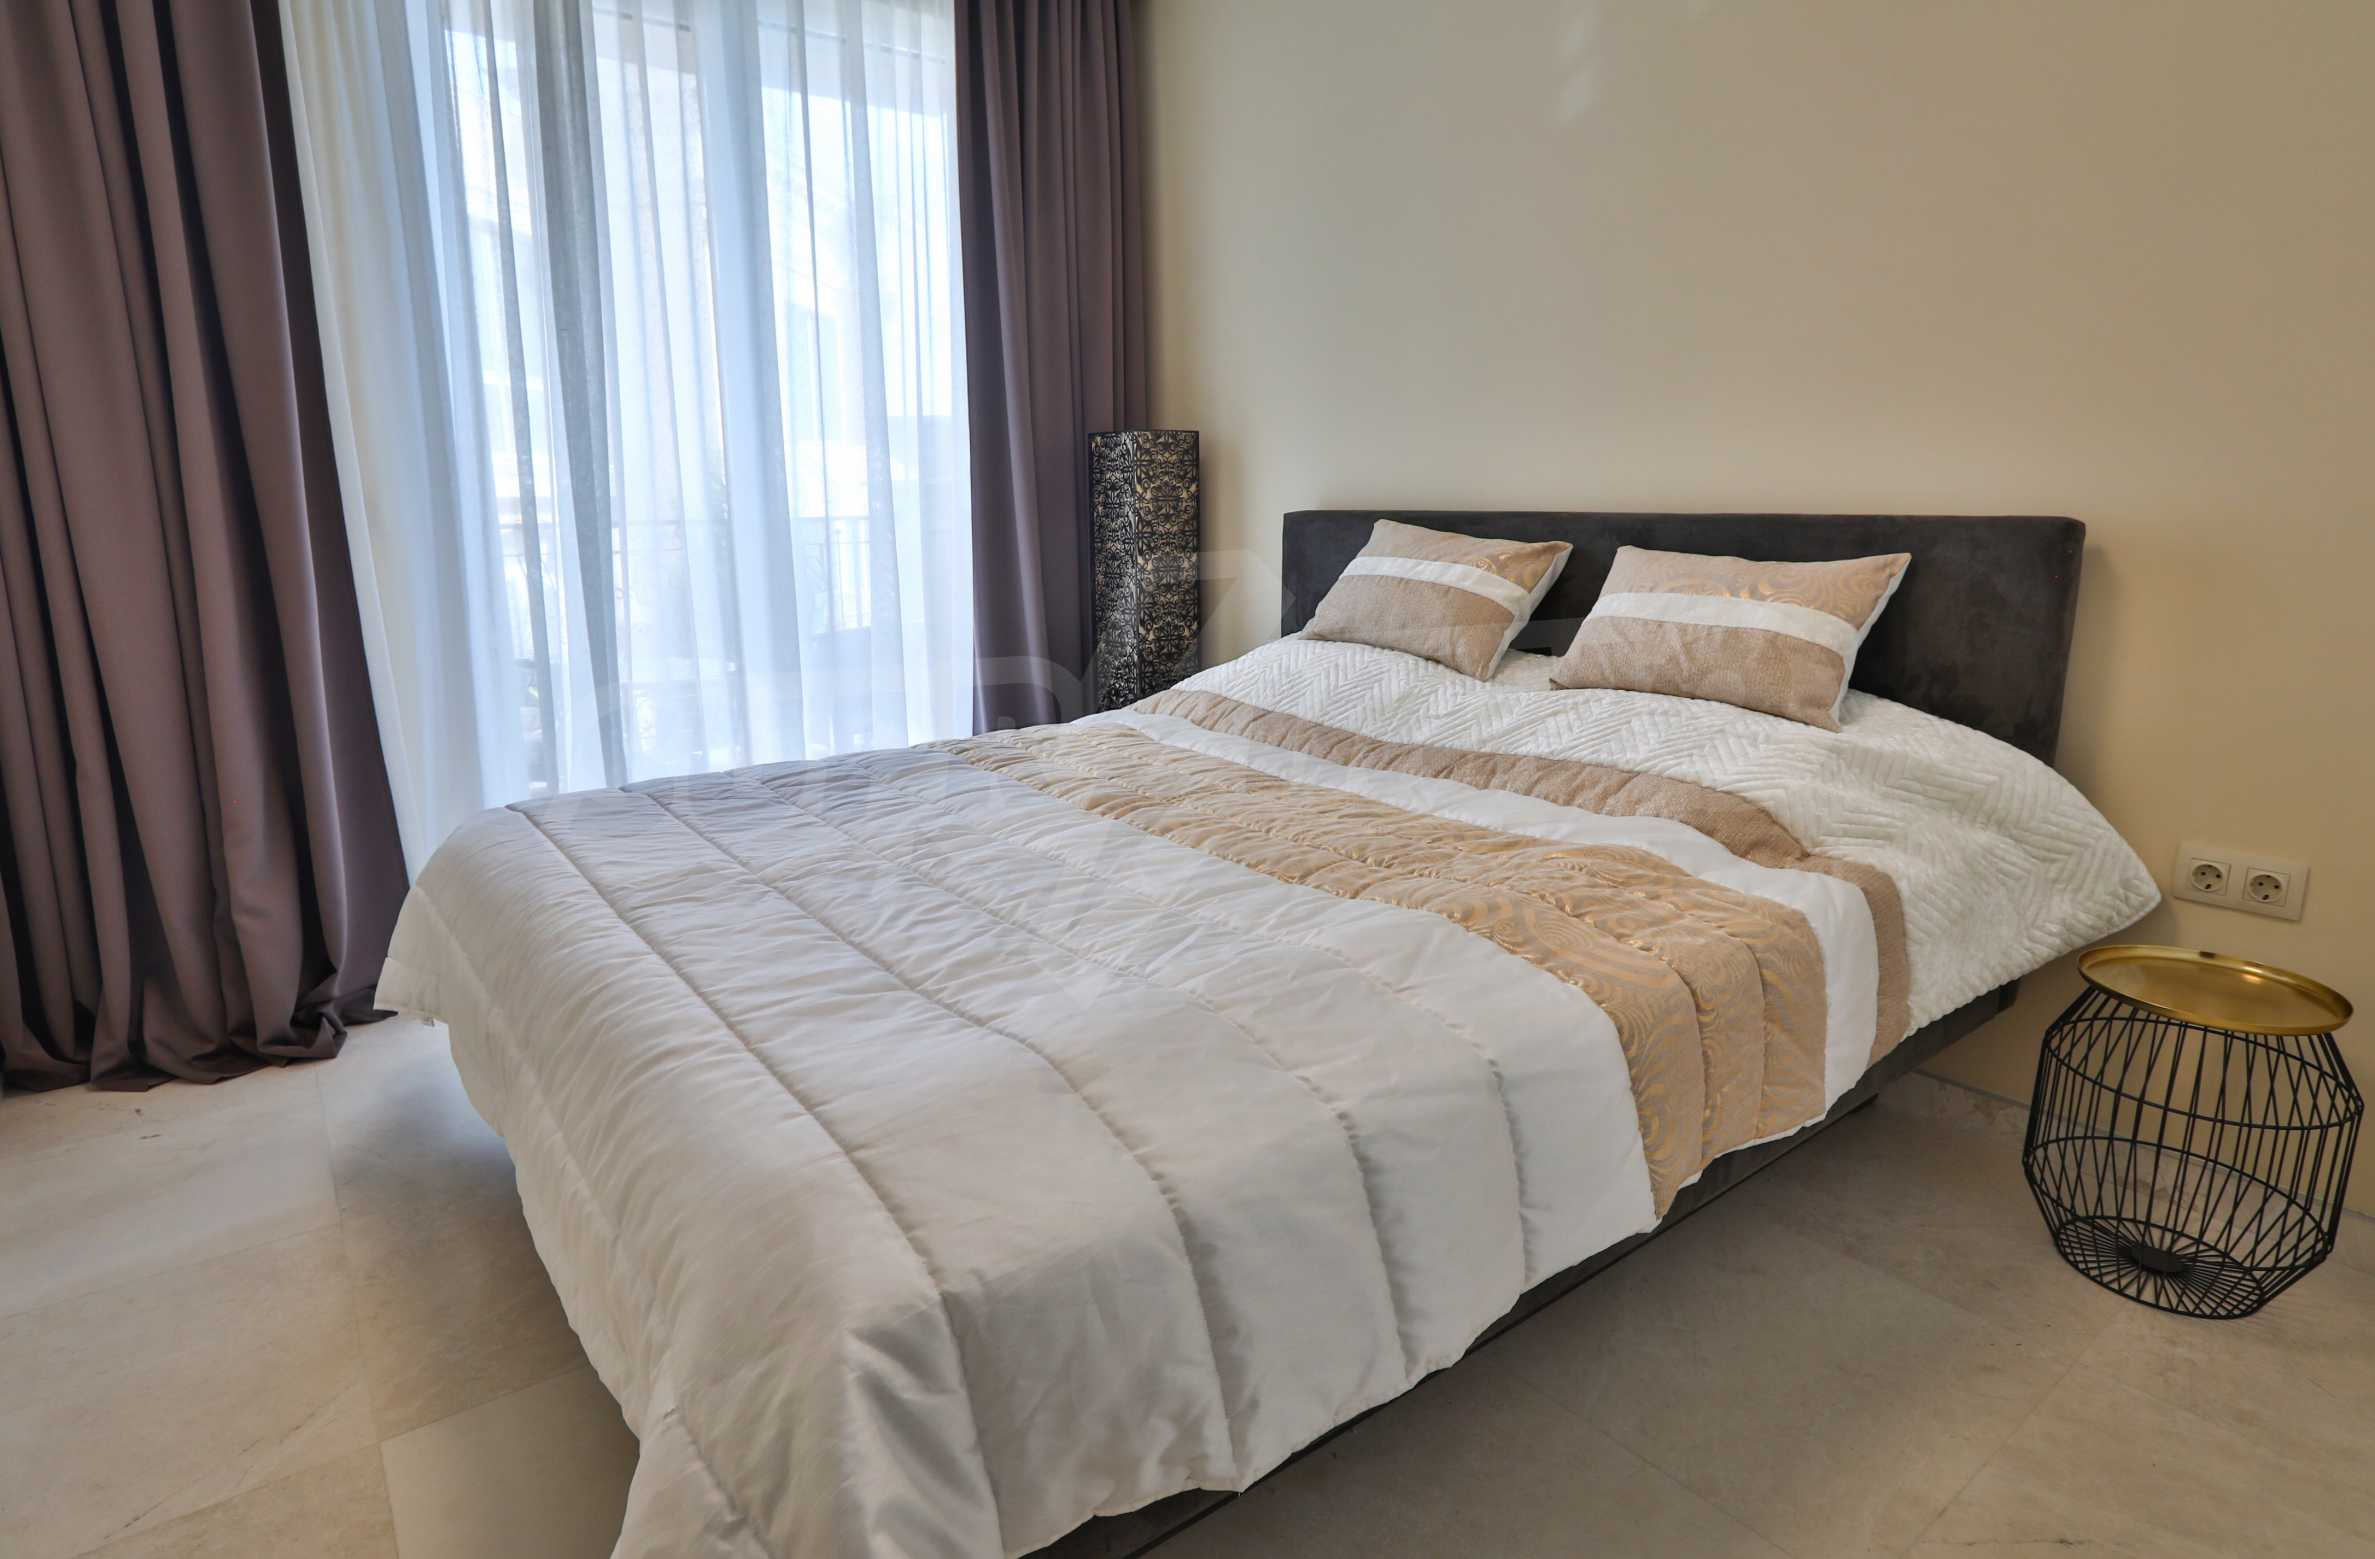 Exclusive 2-bedroom beachfront apartment in the prestigious Belle Époque Beach Residence 18